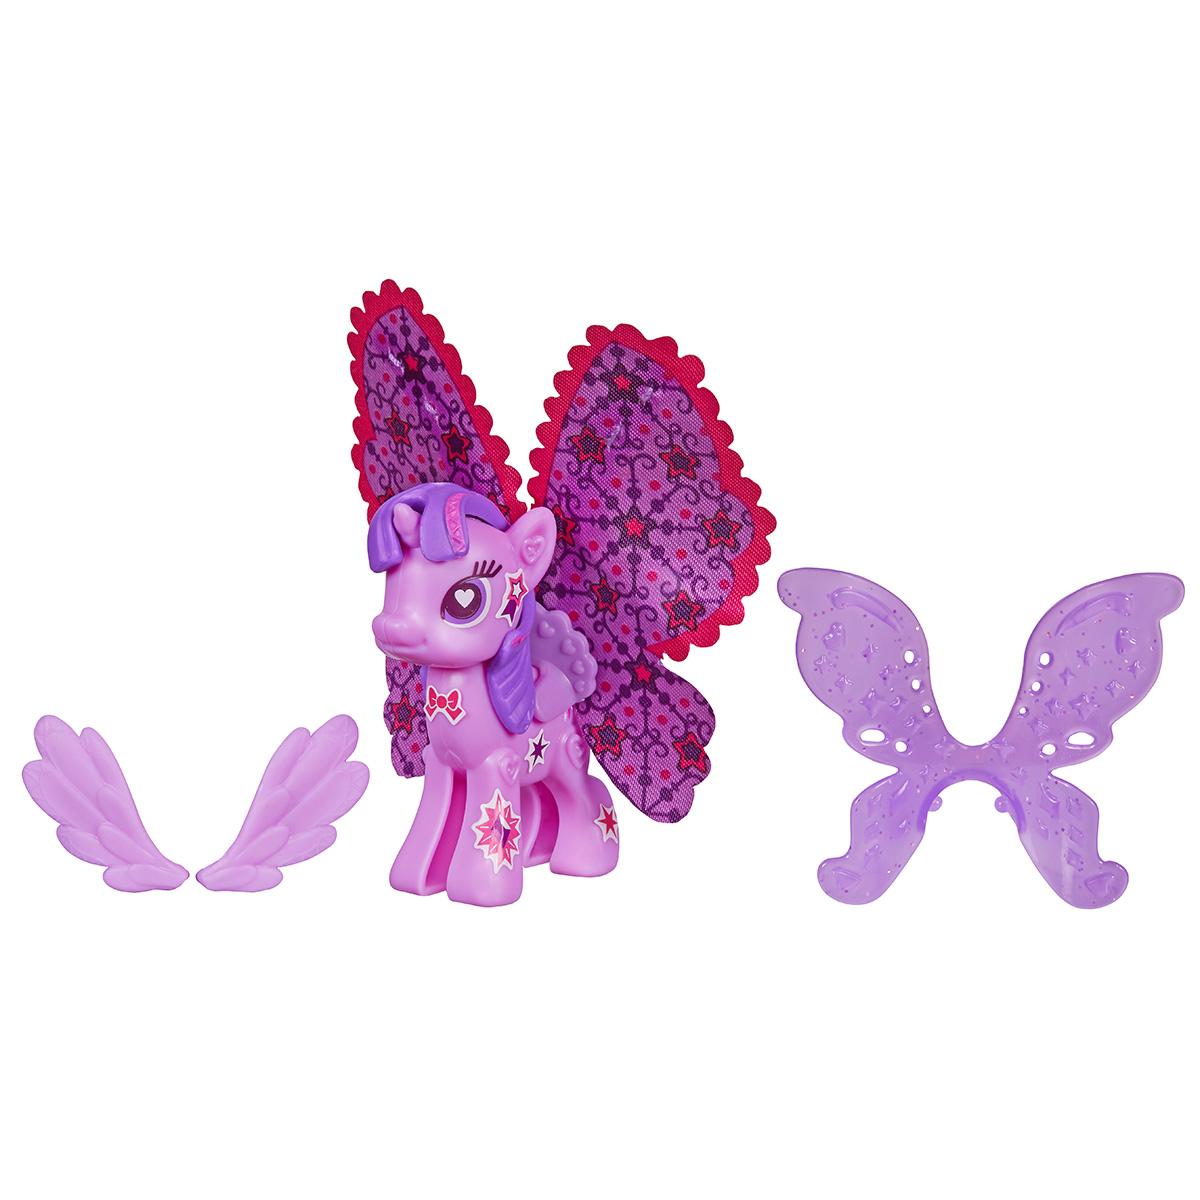 ������� ����� My Little Pony ���� � ��������, ����: ��������� - My Little PonyB0371EU4B0373� ������� �������� ������ My Little Pony ���� � �������� �� �������� ������� ������� ���� �������� ������ � ��������� �������� ������ ������, ������ �� ������������ �����! � ������ ��������� ��� �����������: ������ �������, ��������� �������� ���������� ��������� ����� �����, �����, �������, ��������� ����� ������� - �� ��������� �� ��������, � ��� ��������� ��������, �������� ����� �������� �������� ��� �������� �������. �� ������������ ������� ���� ����� ���������� ���������� ������ ������, � ����� �������� ������������ ������� ������������� ���������� ����������, �������� ������������ �����. �������, ������ � ���� ���������� �� ������ ������� ����� ������ ���� ���� My Little Pony ���������� ����� �����. ������ ��� ����� ������������� ����� ������������� ��������, ������, ���������� � �������� ������ �������, �������� ��-���������� ���������� �������!